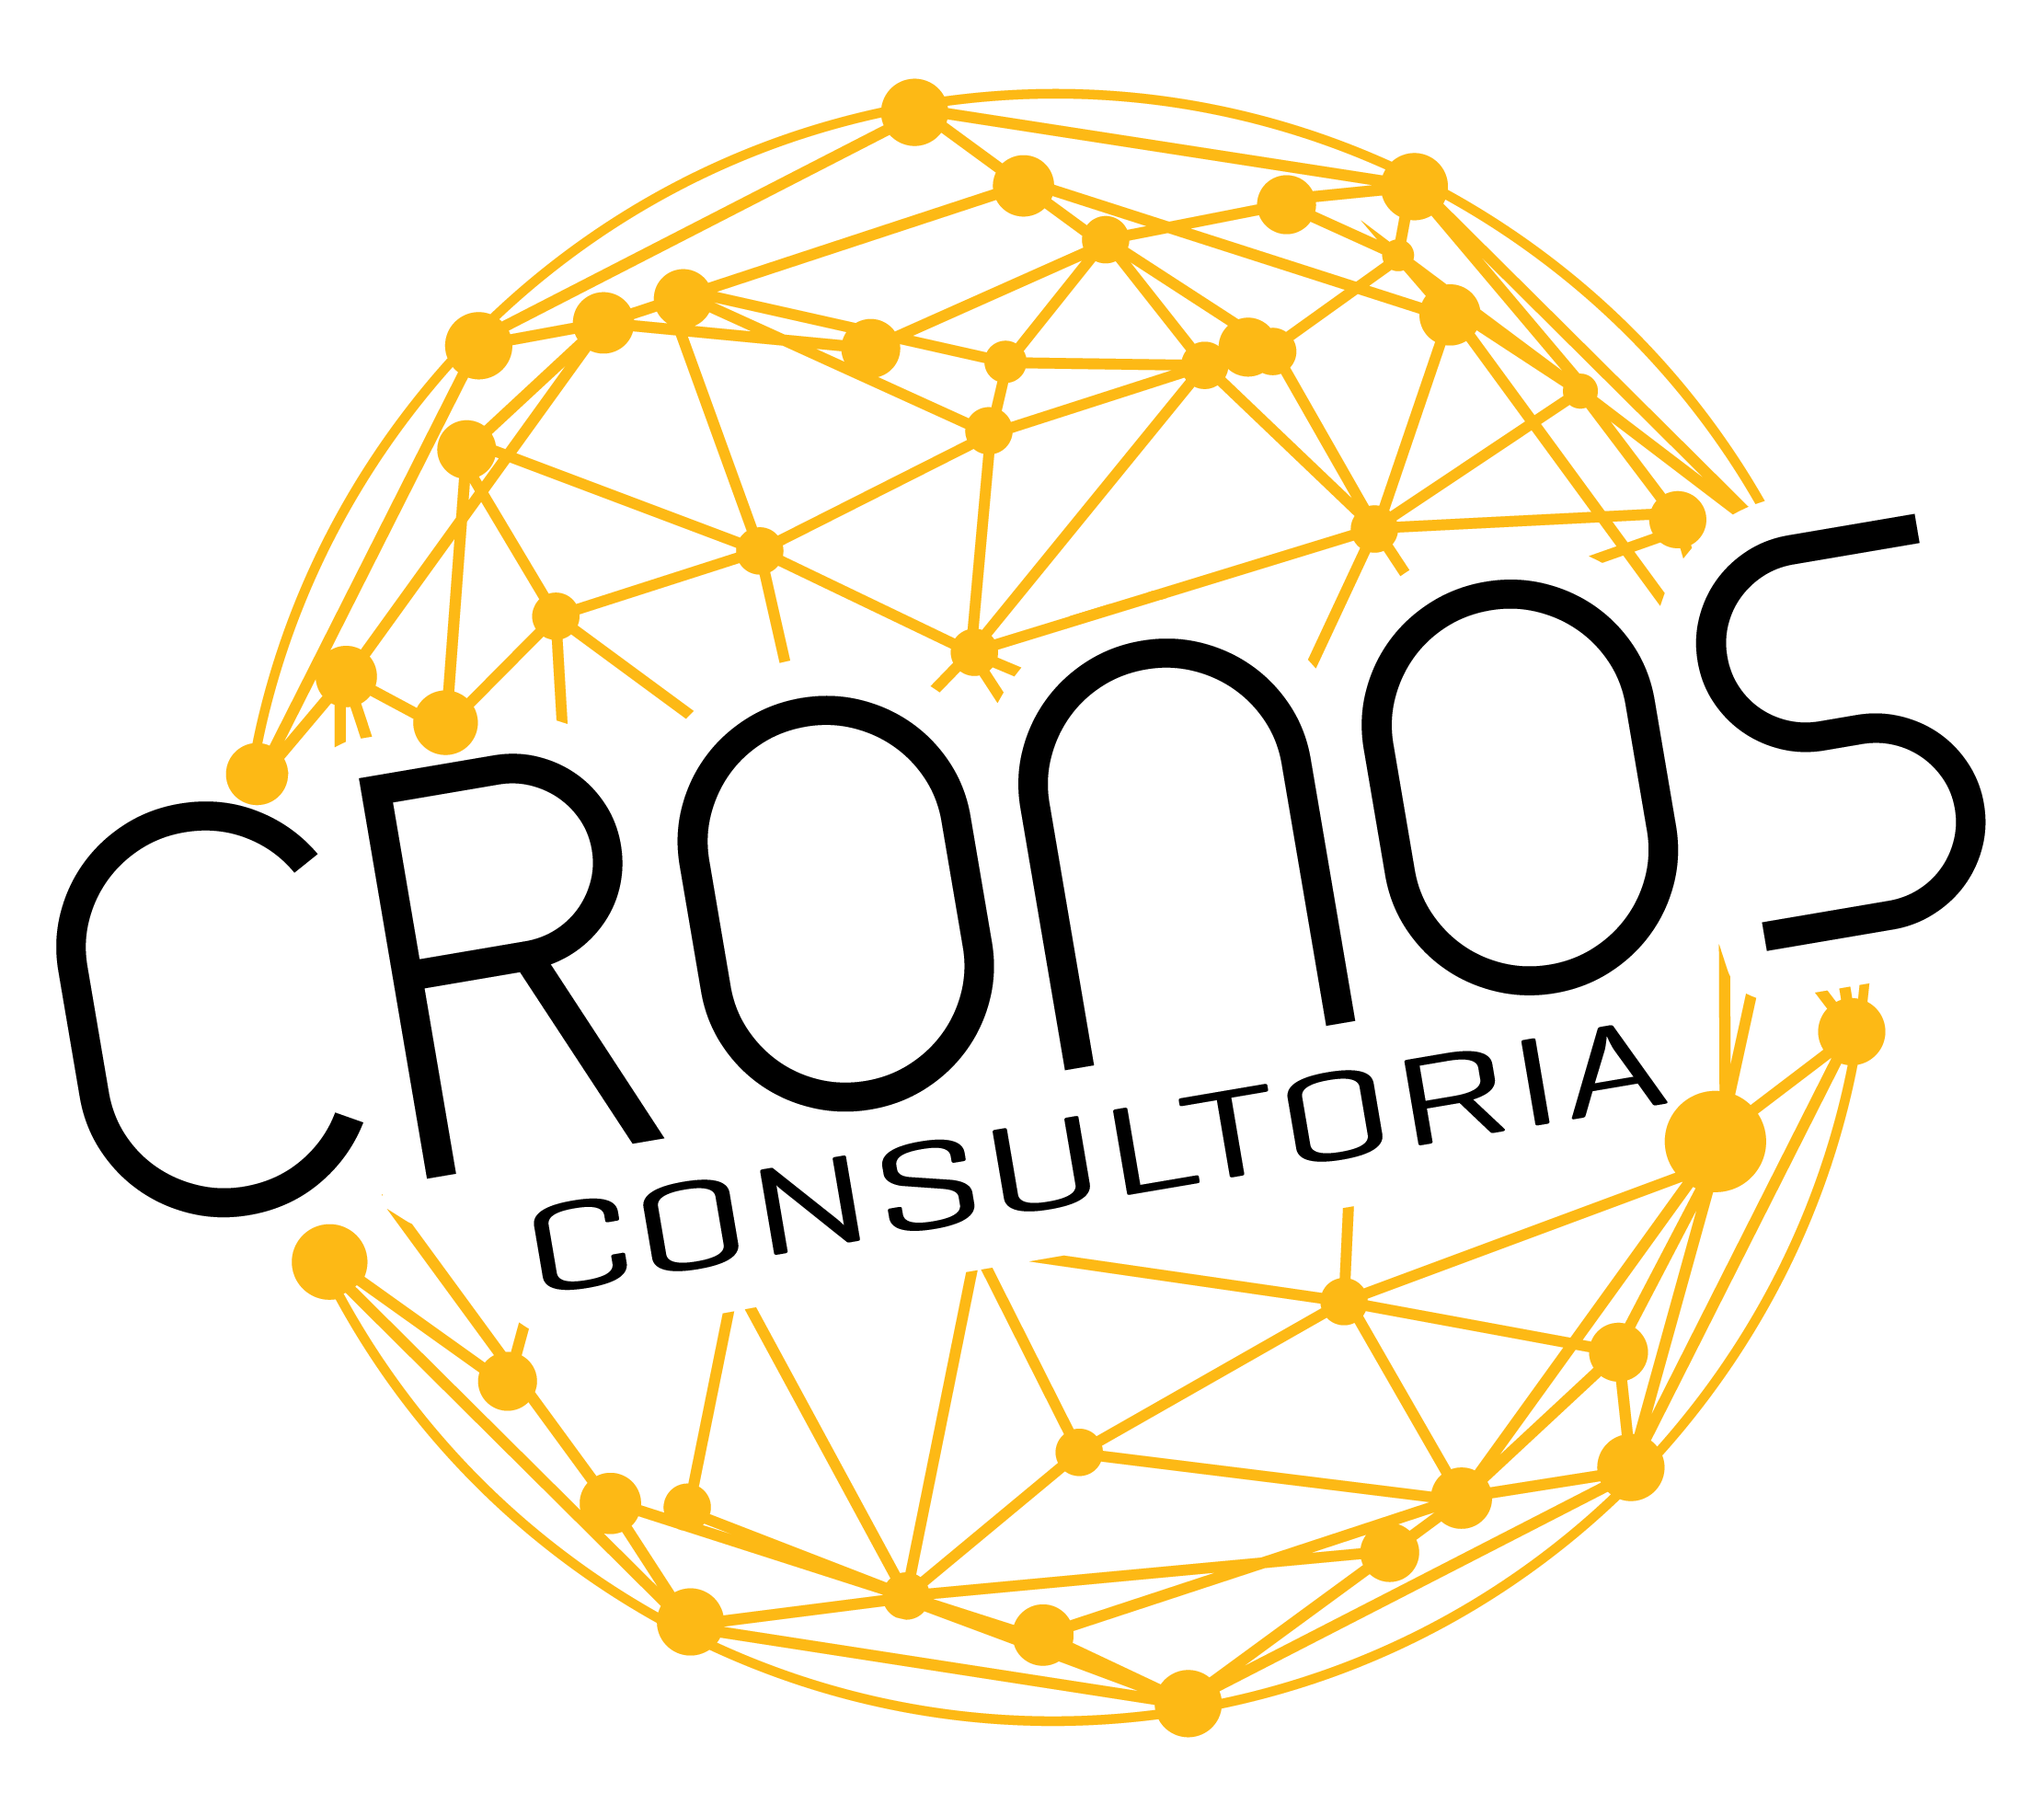 Logotipo Cronos Consultoria